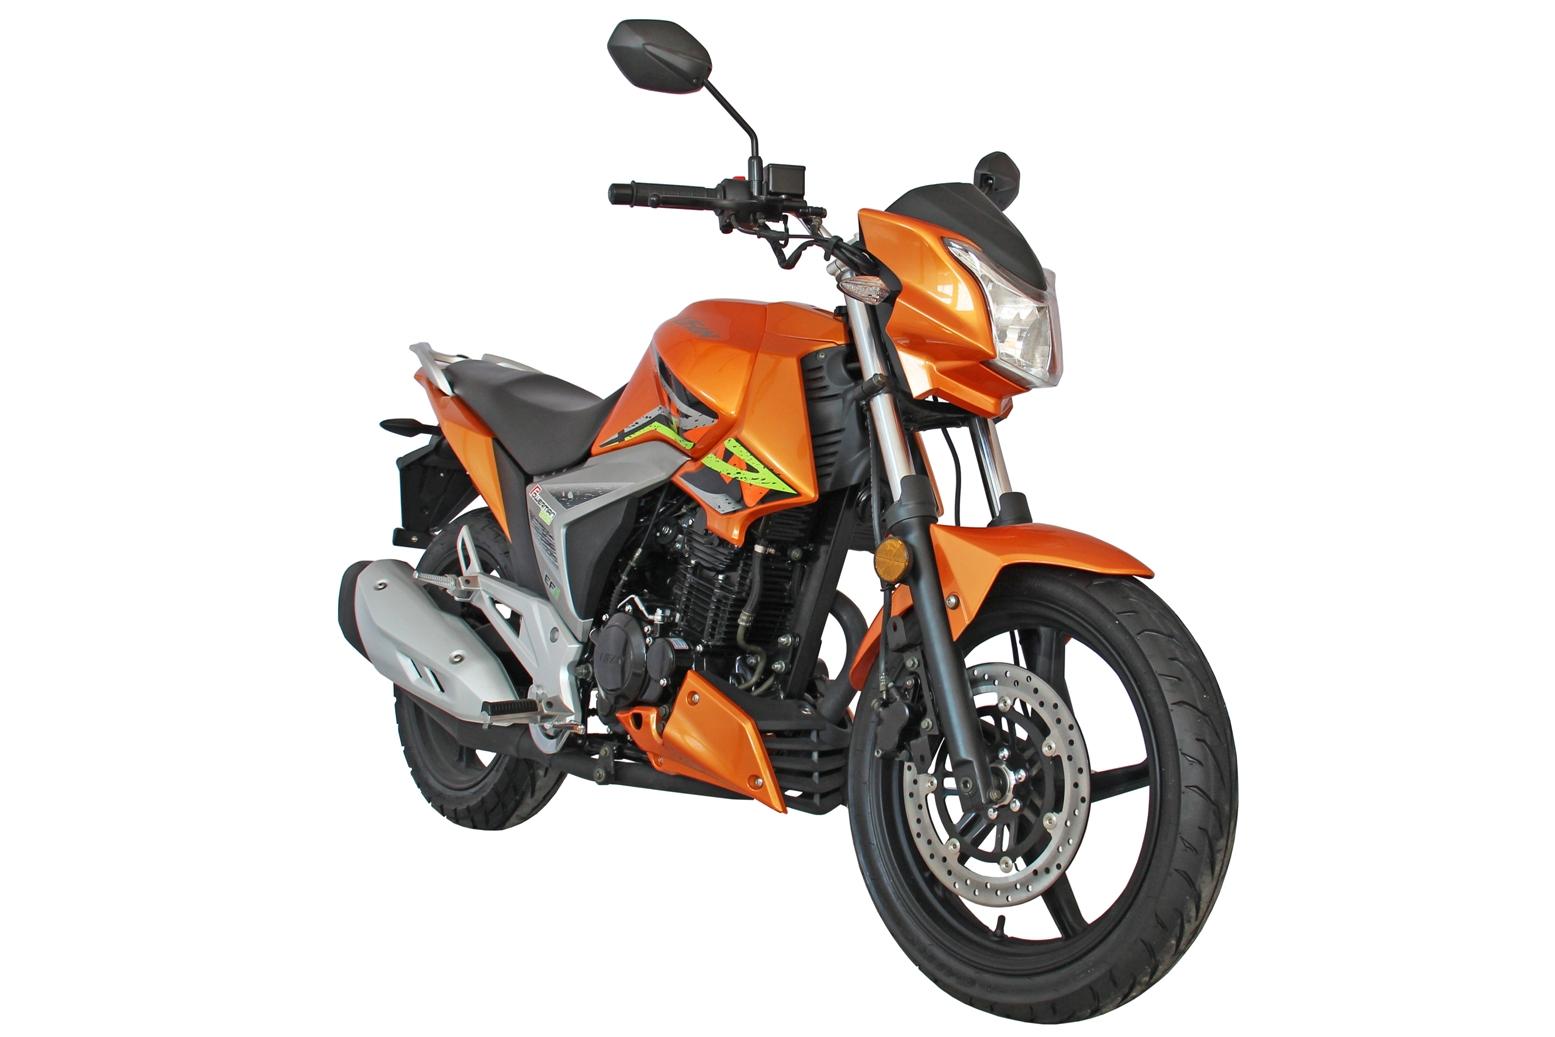 МОТОЦИКЛ LIFAN LF250-3A Orange Pin  Артмото - купить квадроцикл в украине и харькове, мотоцикл, снегоход, скутер, мопед, электромобиль